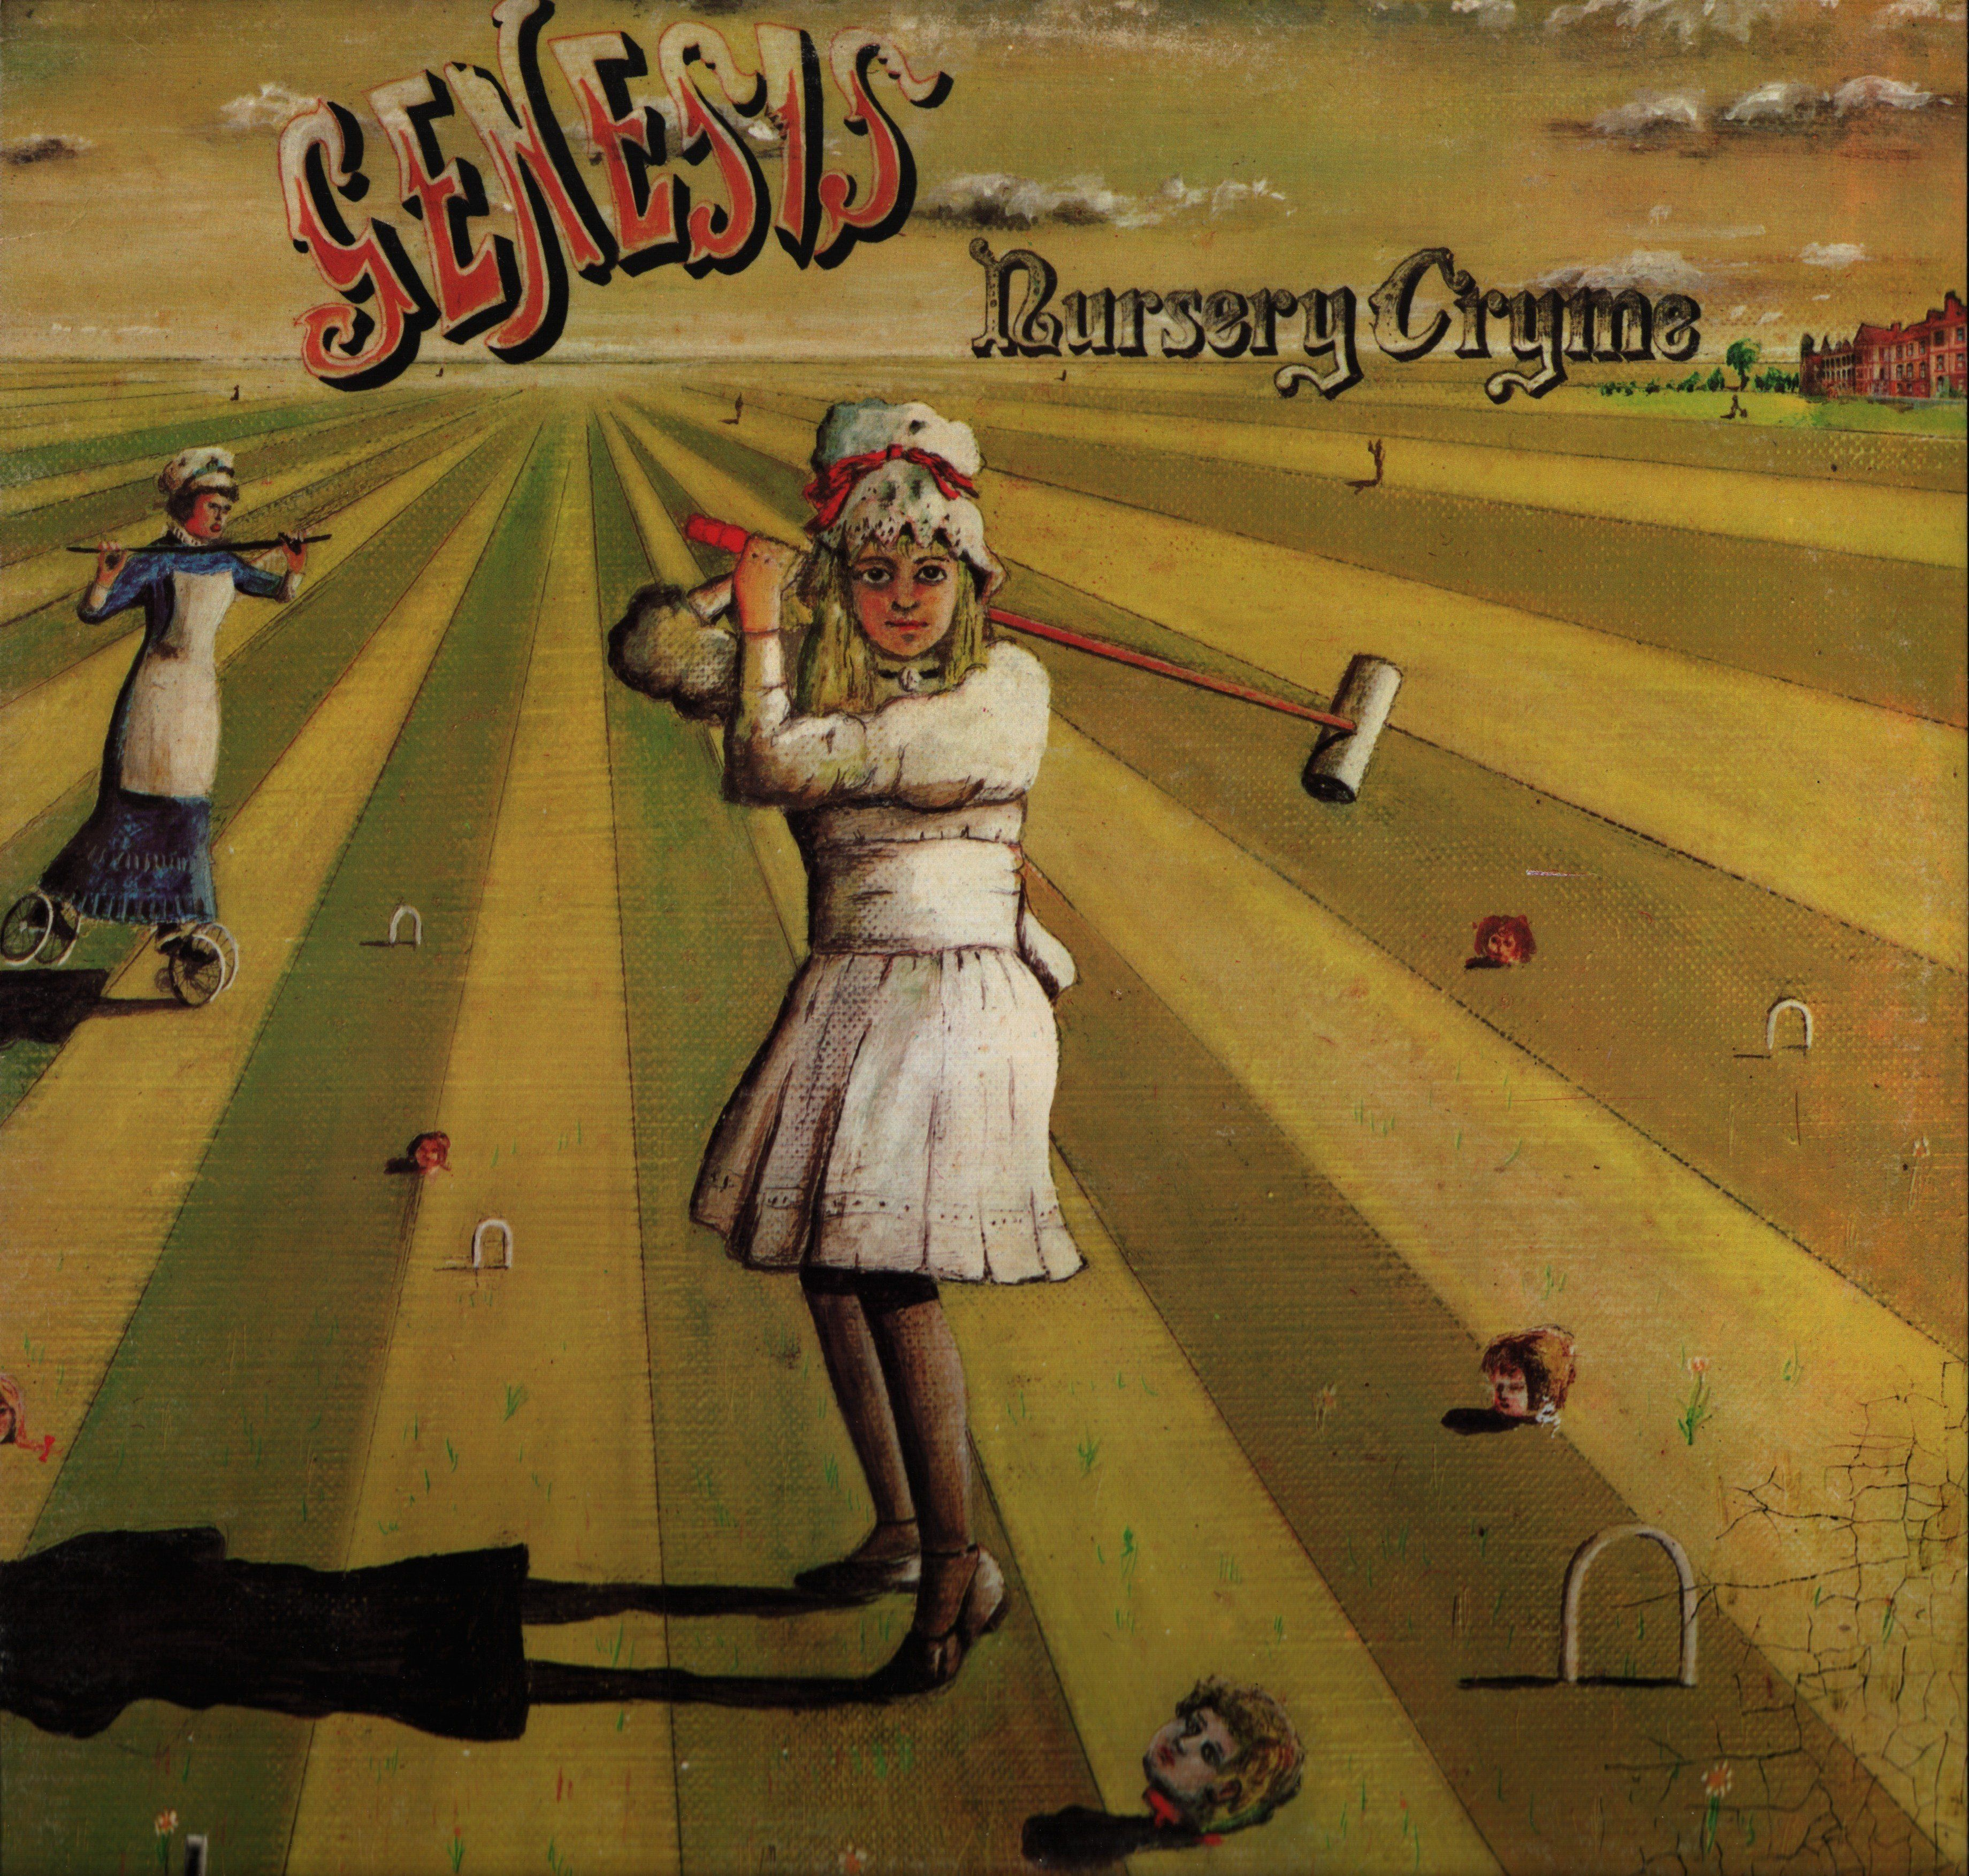 Genesis Nursery Cryme Vinyl Record Al Scratch On Side Two